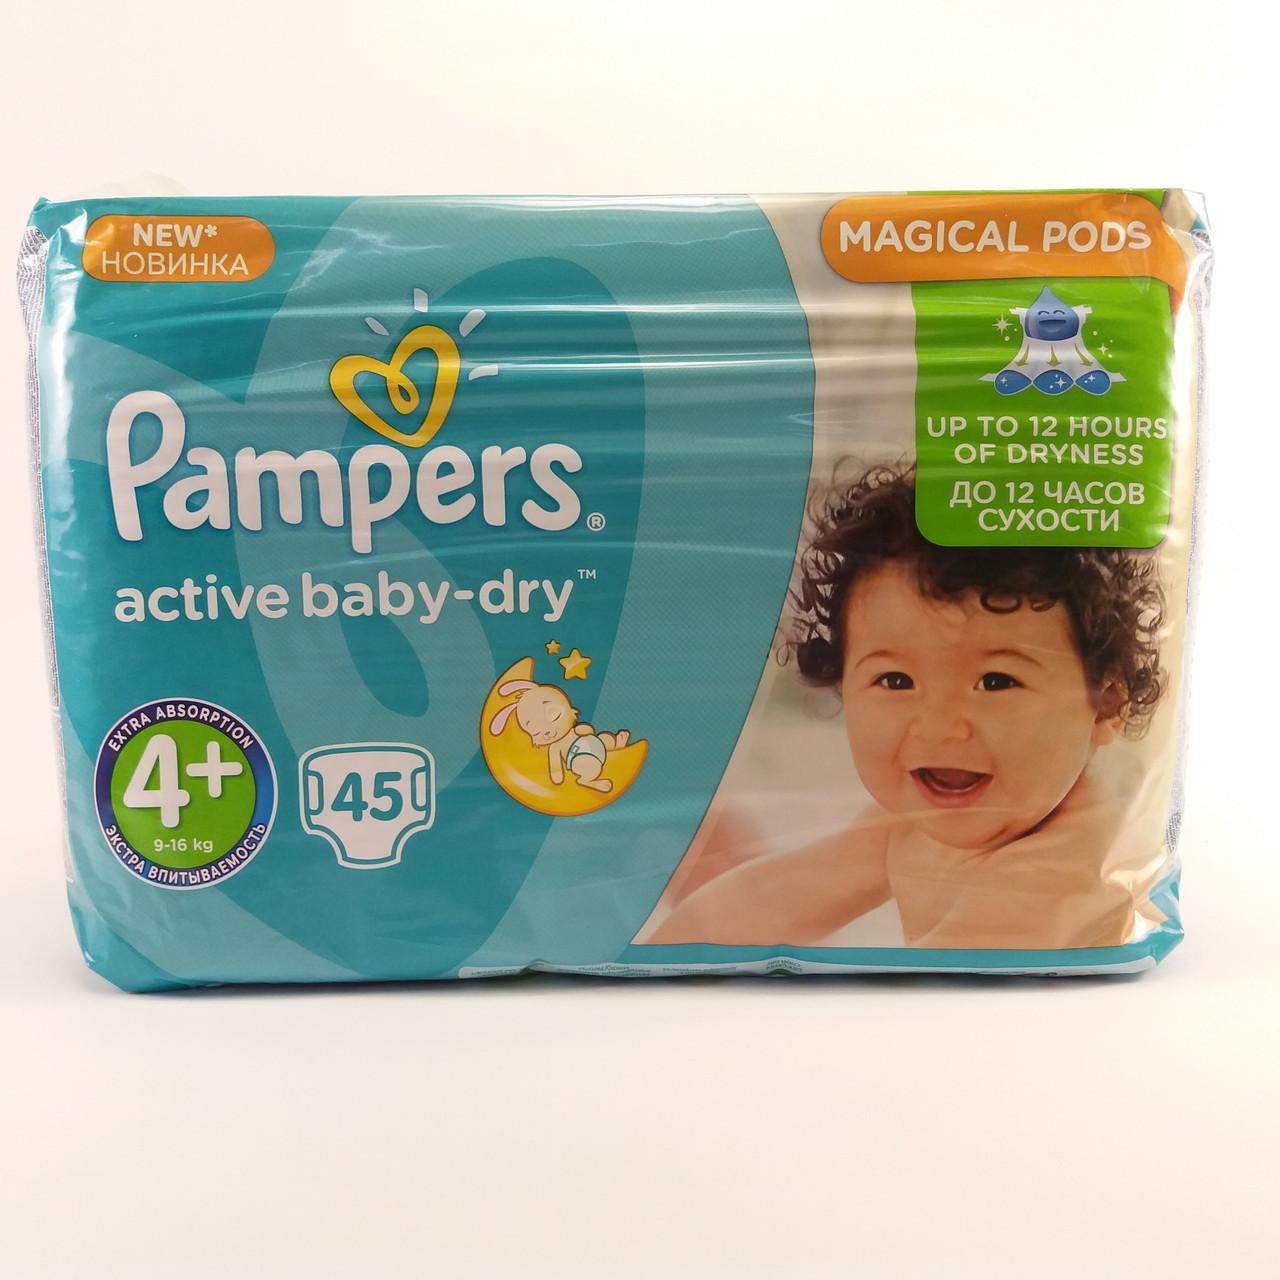 Подгузник детский Pampers active baby-dry 4+, 9-16кг 45шт